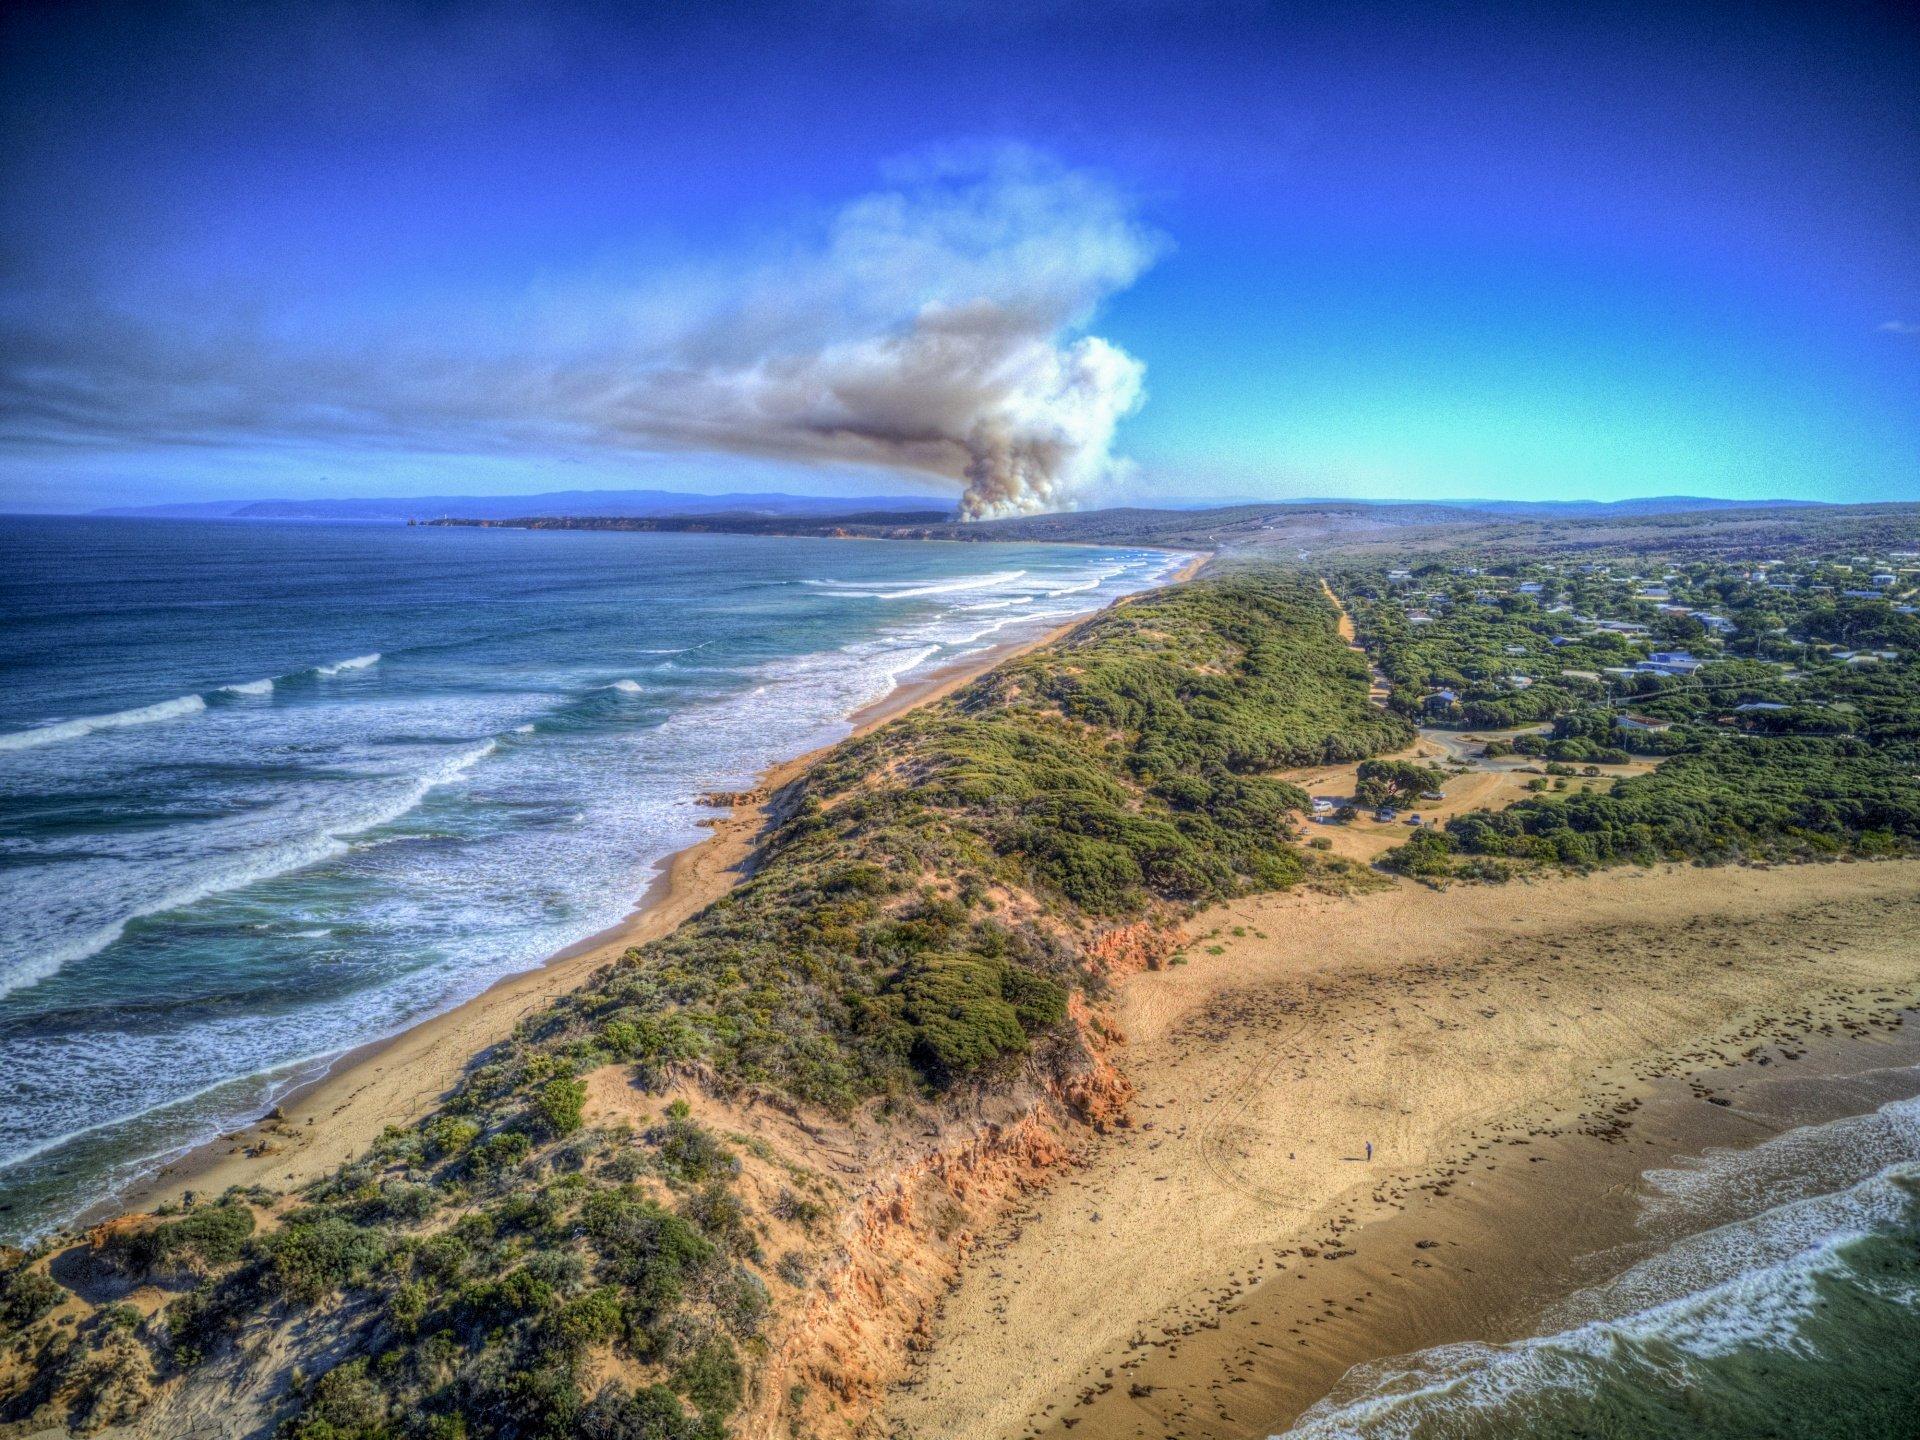 Coastal Public Access and Risk Grants